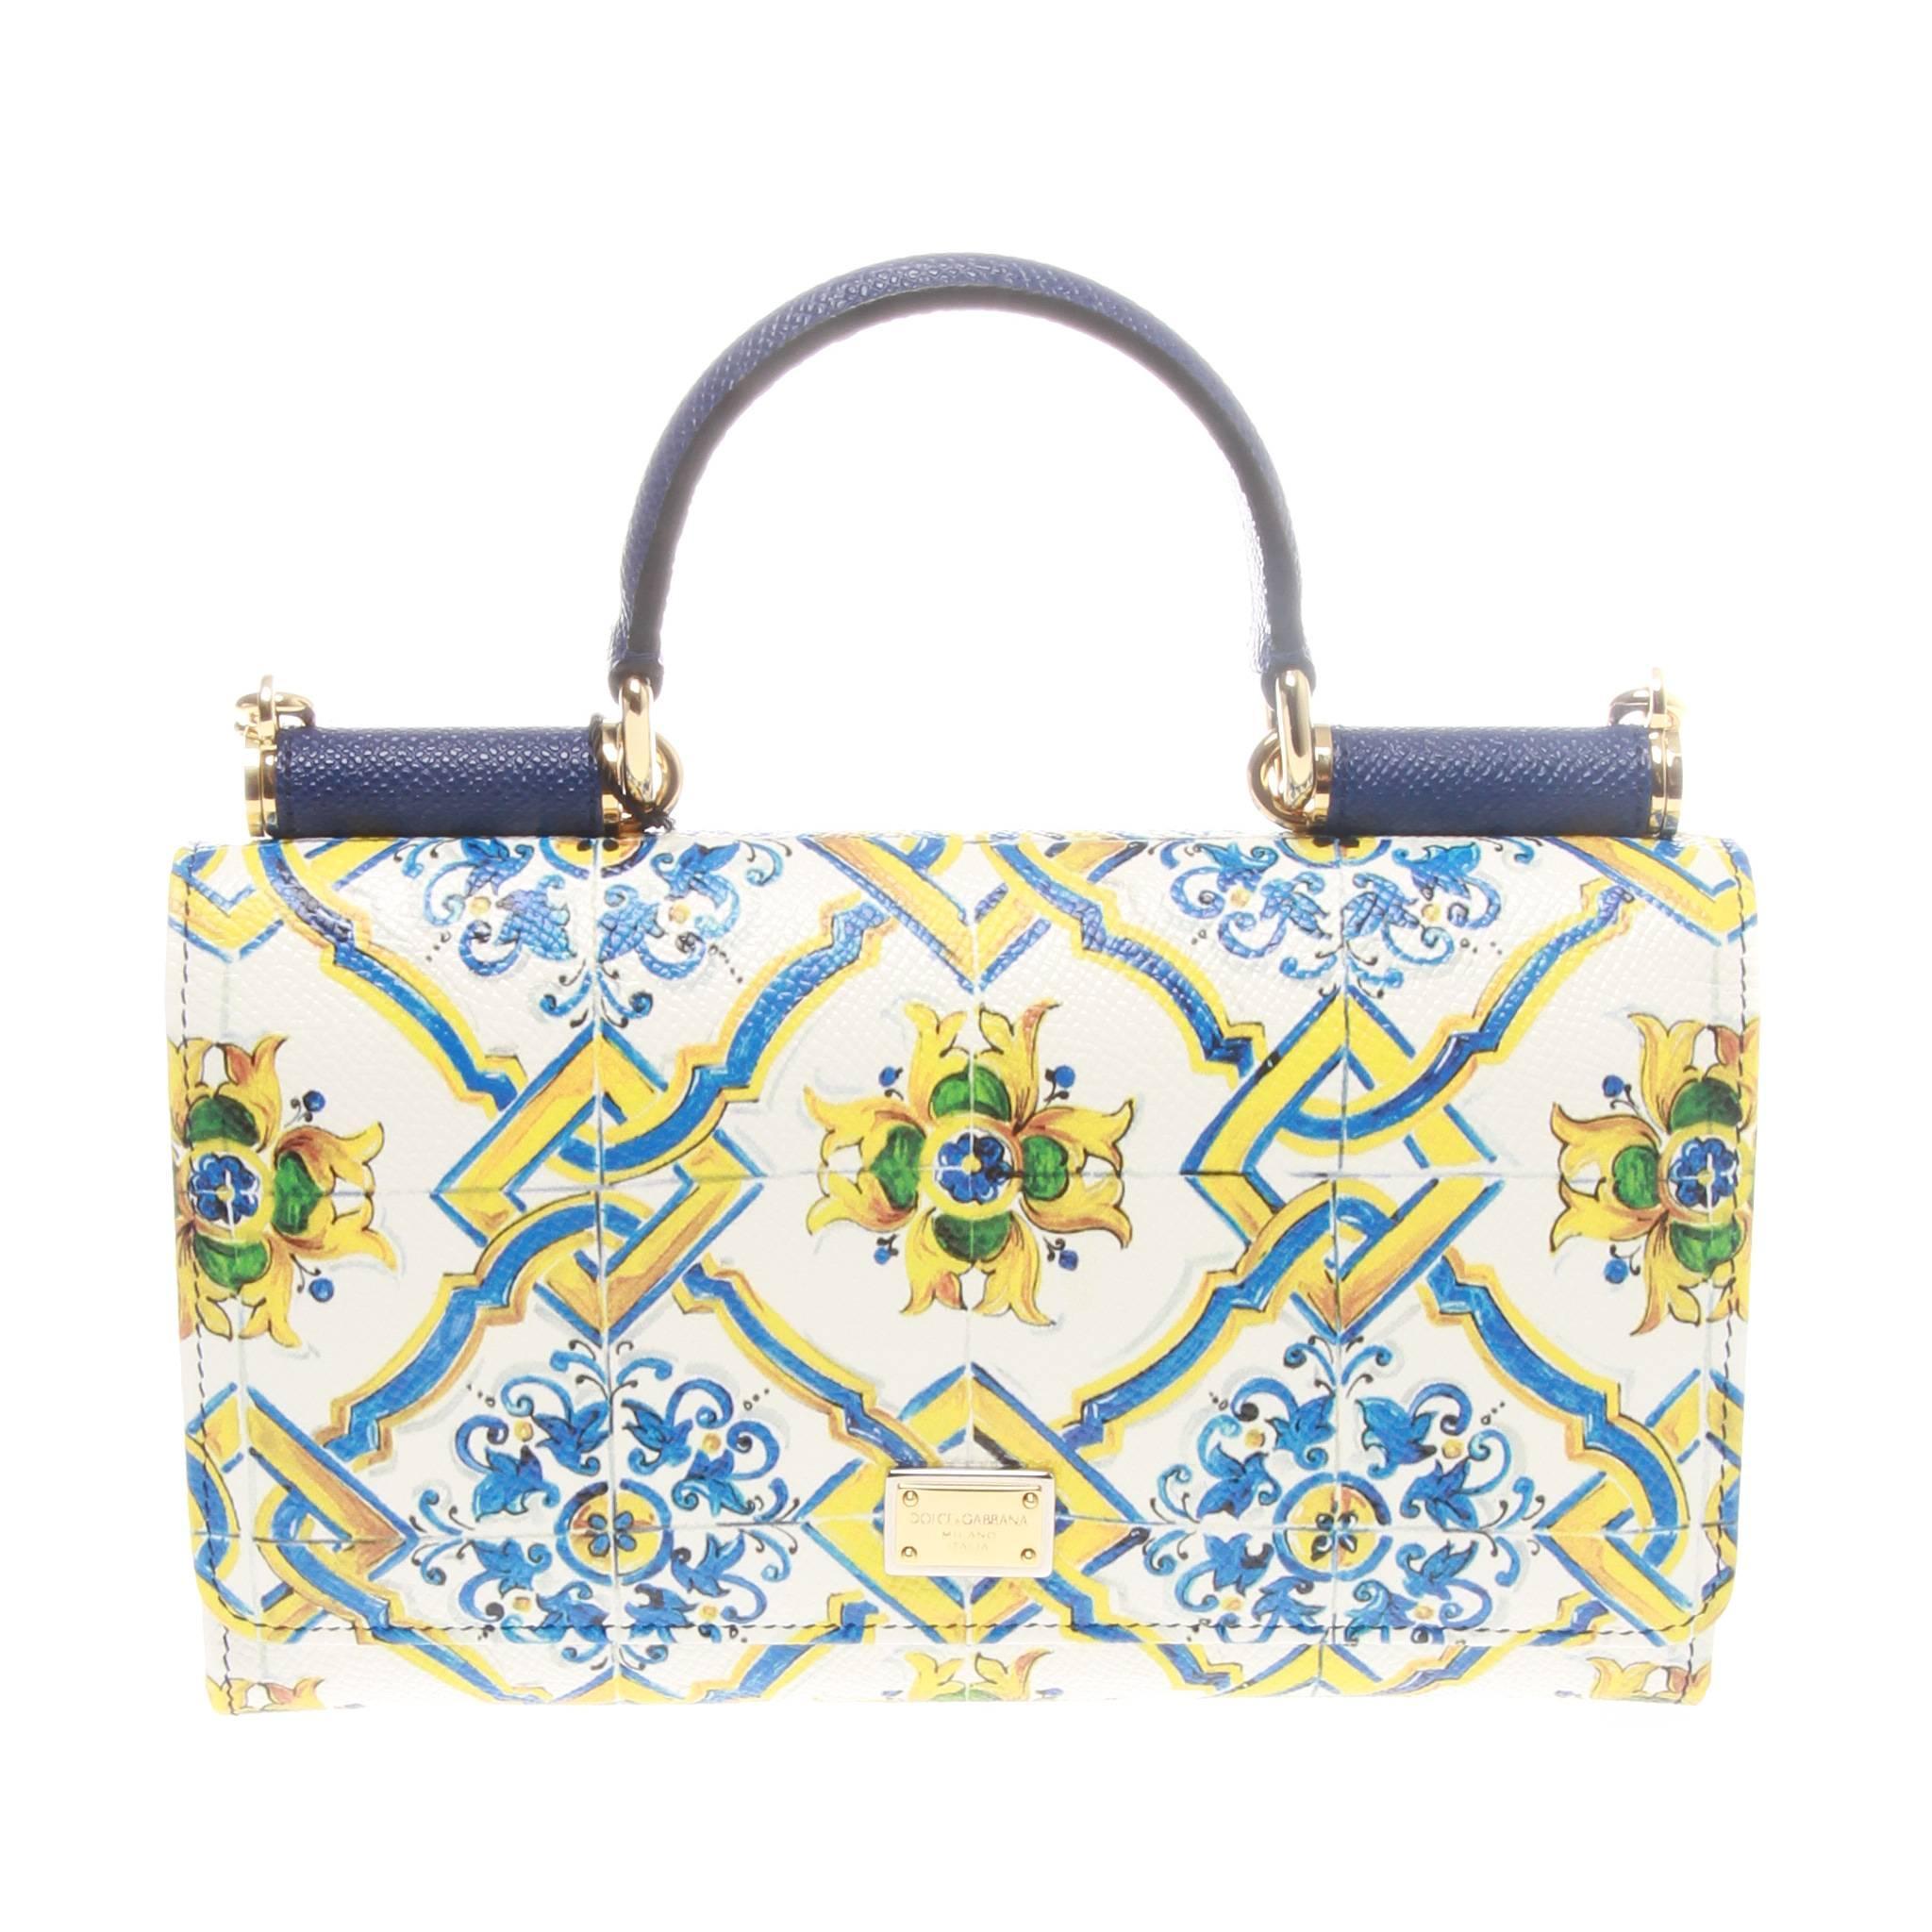 291a01d85b Dolce and Gabbana Mini  Von  Crossbody Bag Wallet at 1stdibs